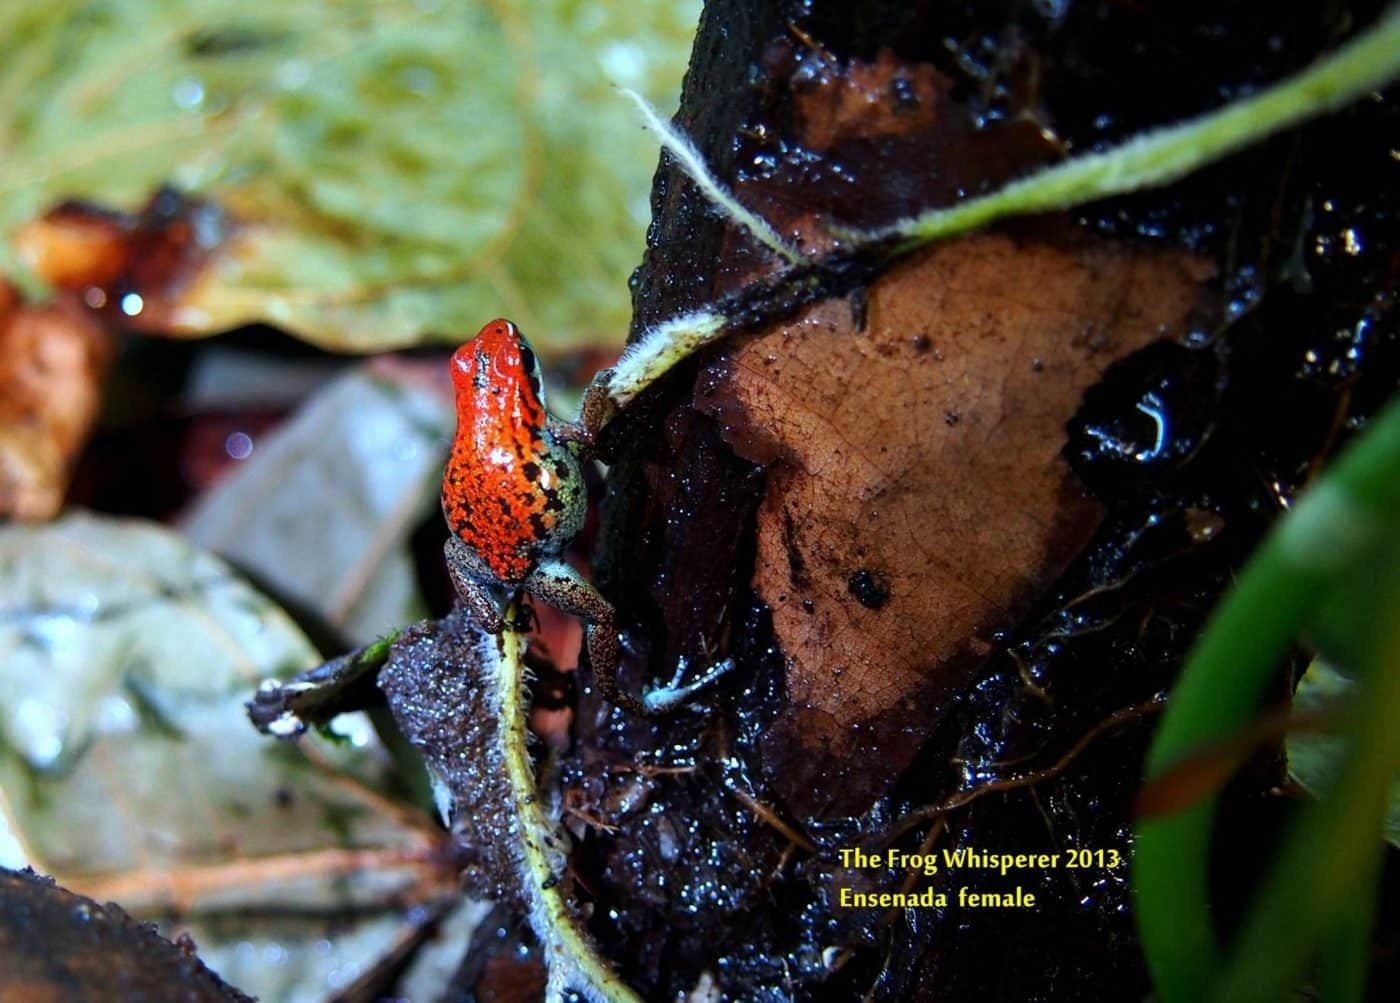 Oophaga pumilio esenada dart frog